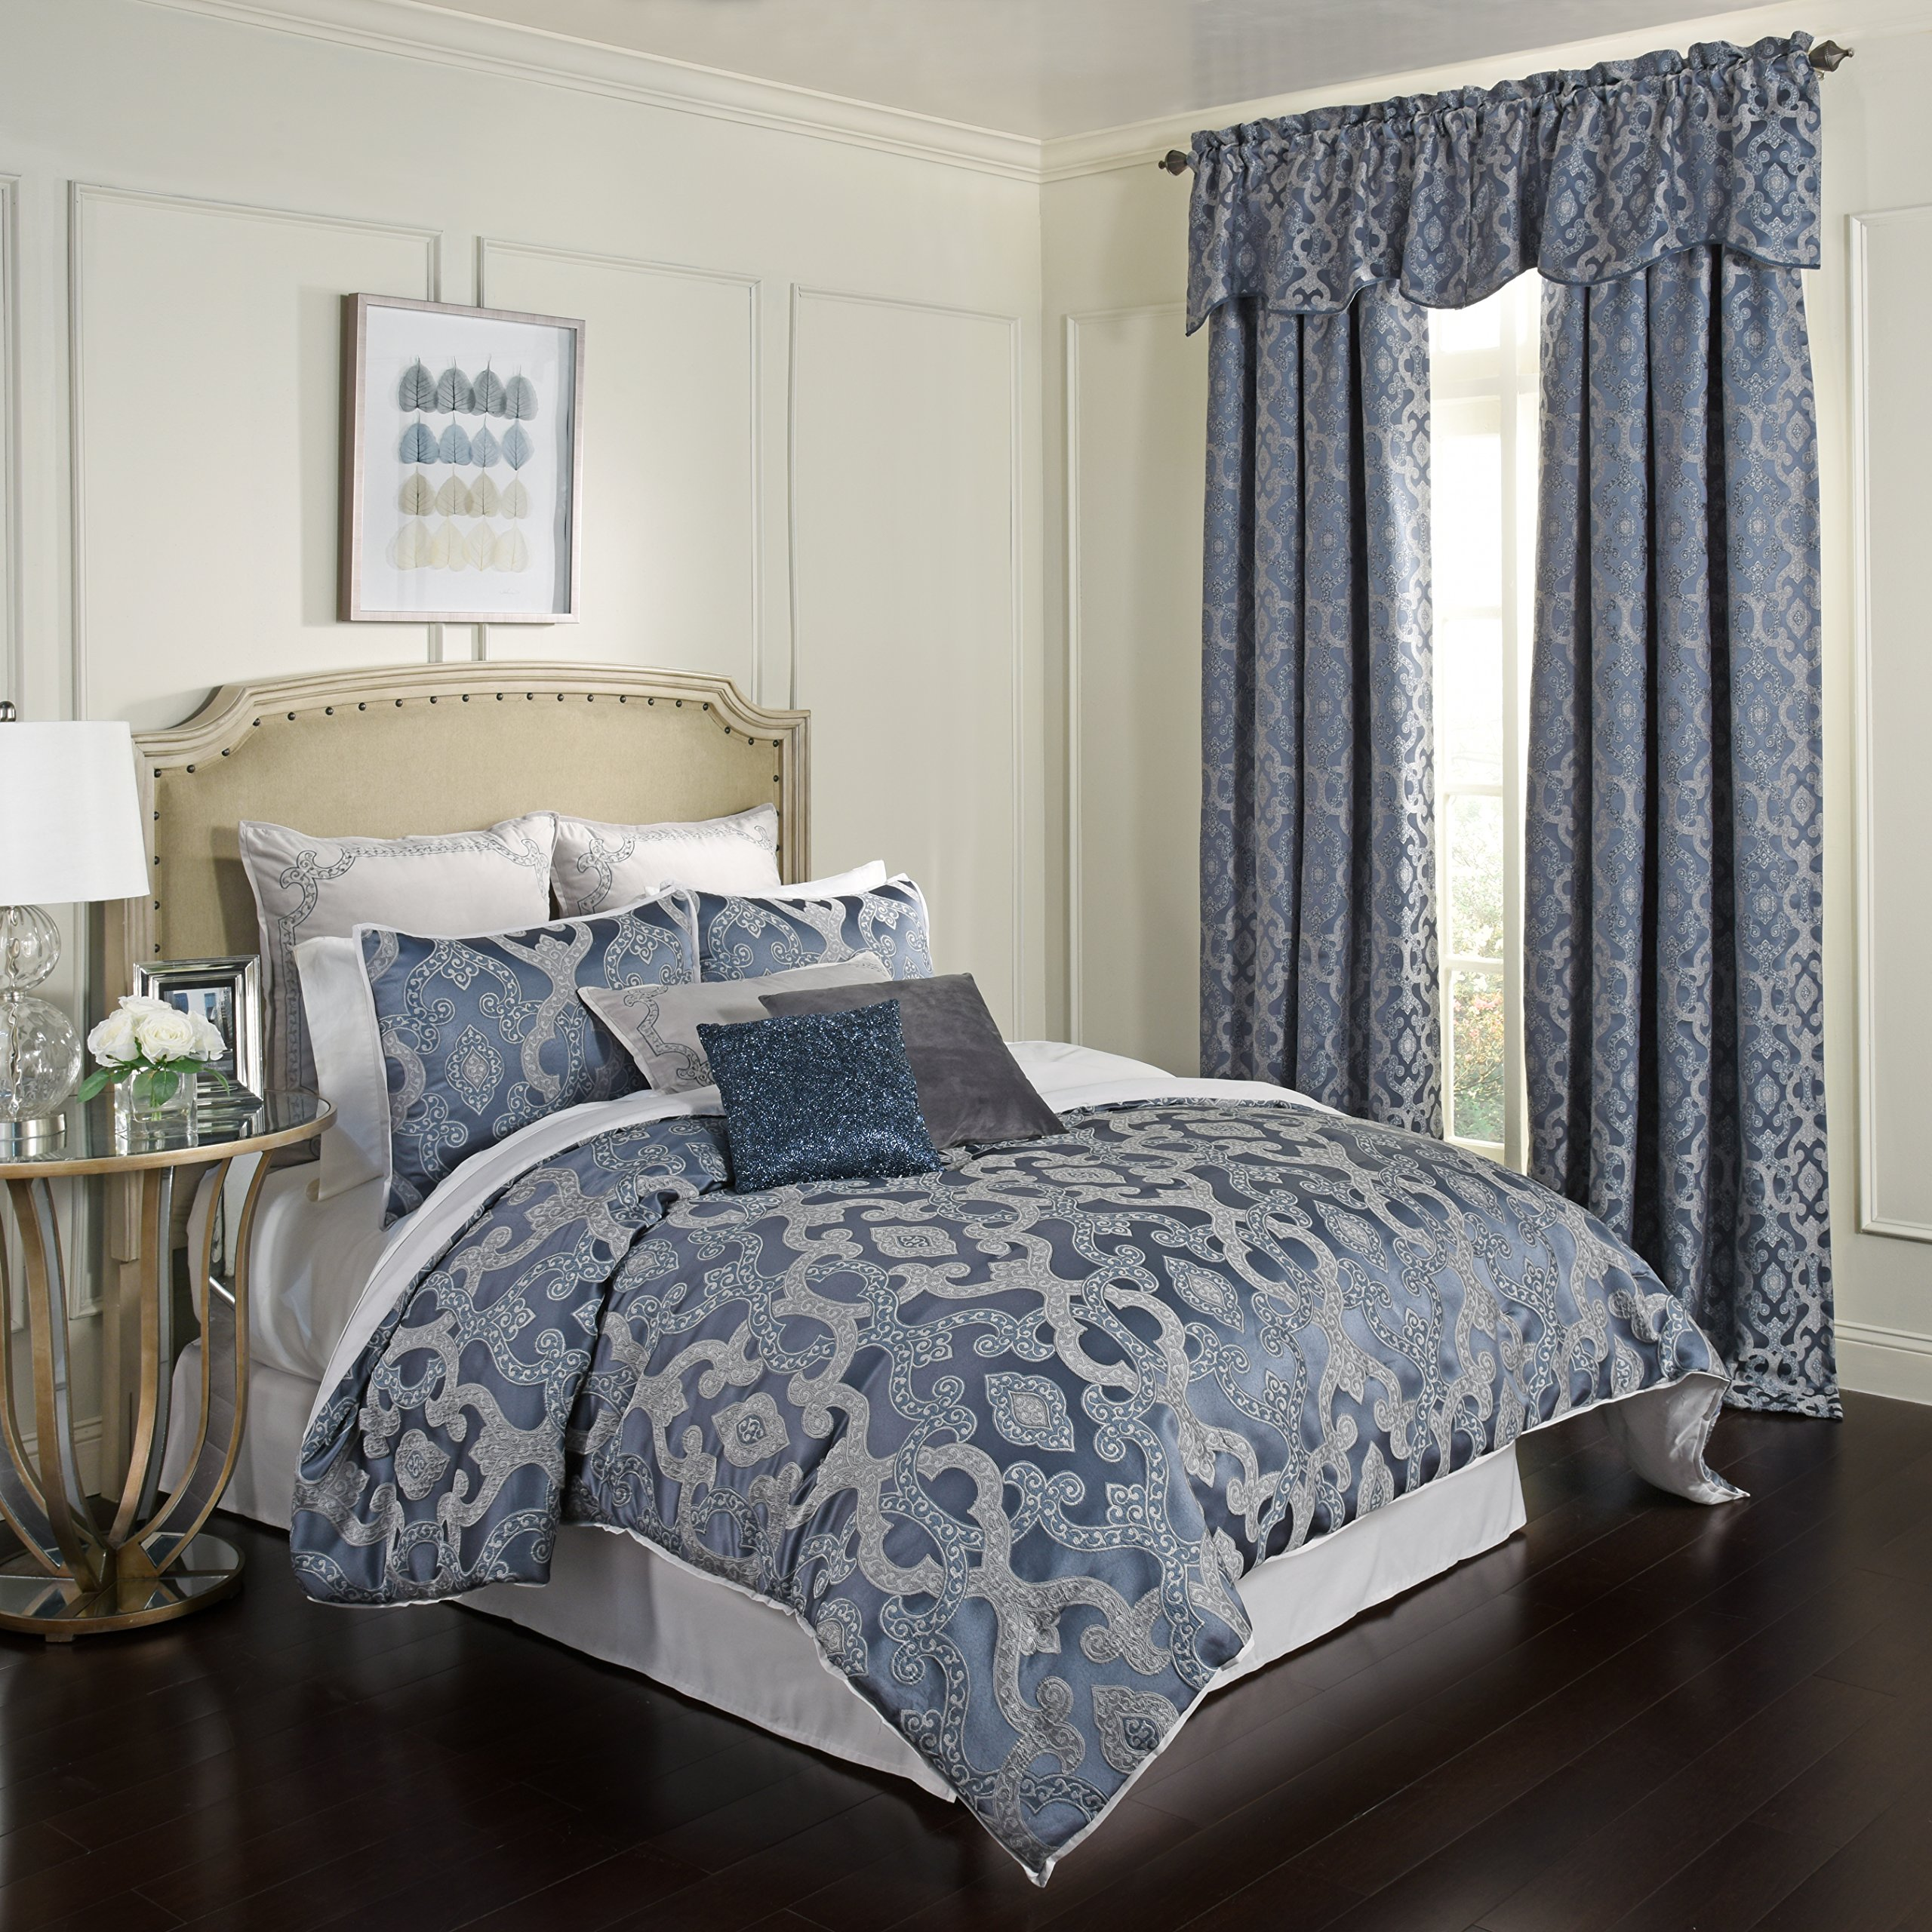 Beautyrest 17034BEDDKNGLAP Normandy Comforter Set, King, Lapis